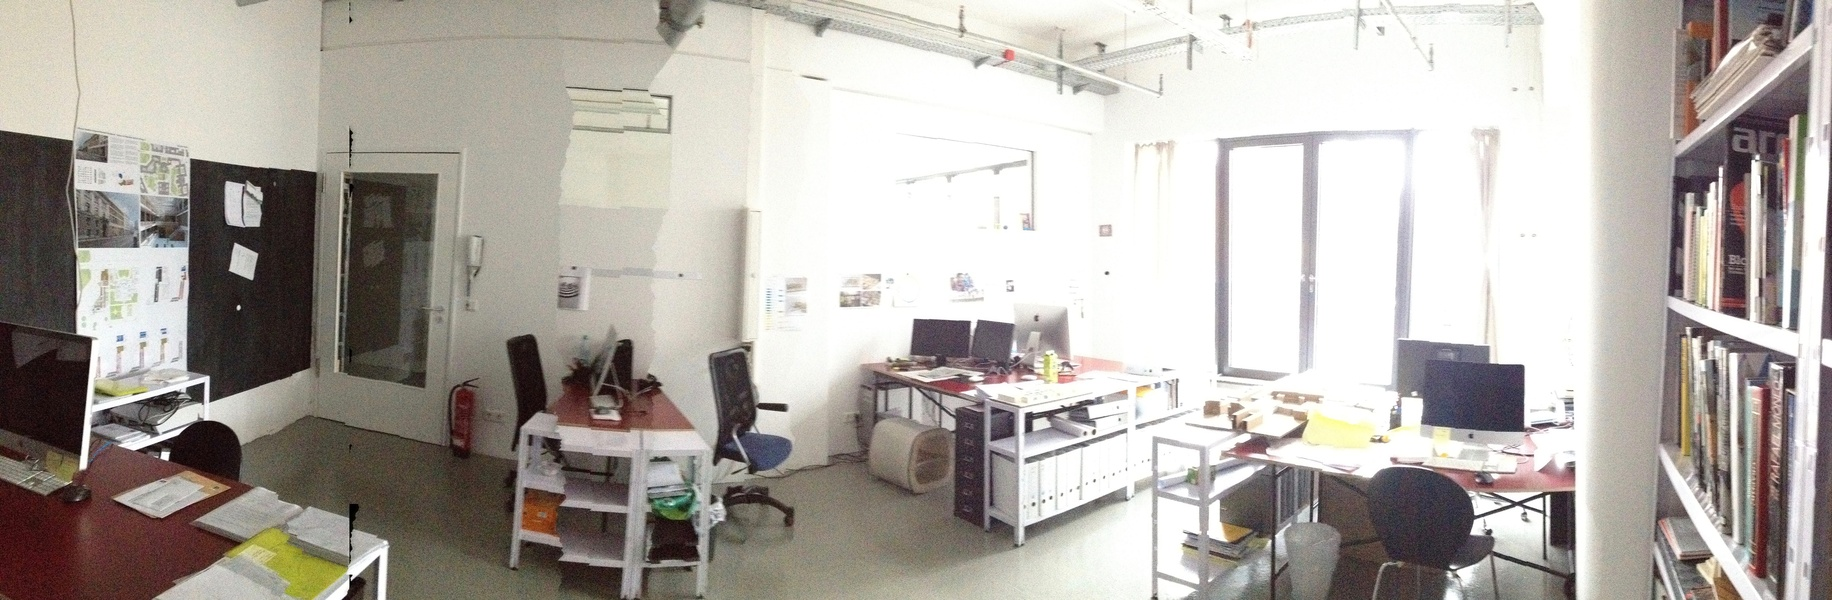 beautiful co-working space @ planet modulor/moritzplatz-kreuzberg available